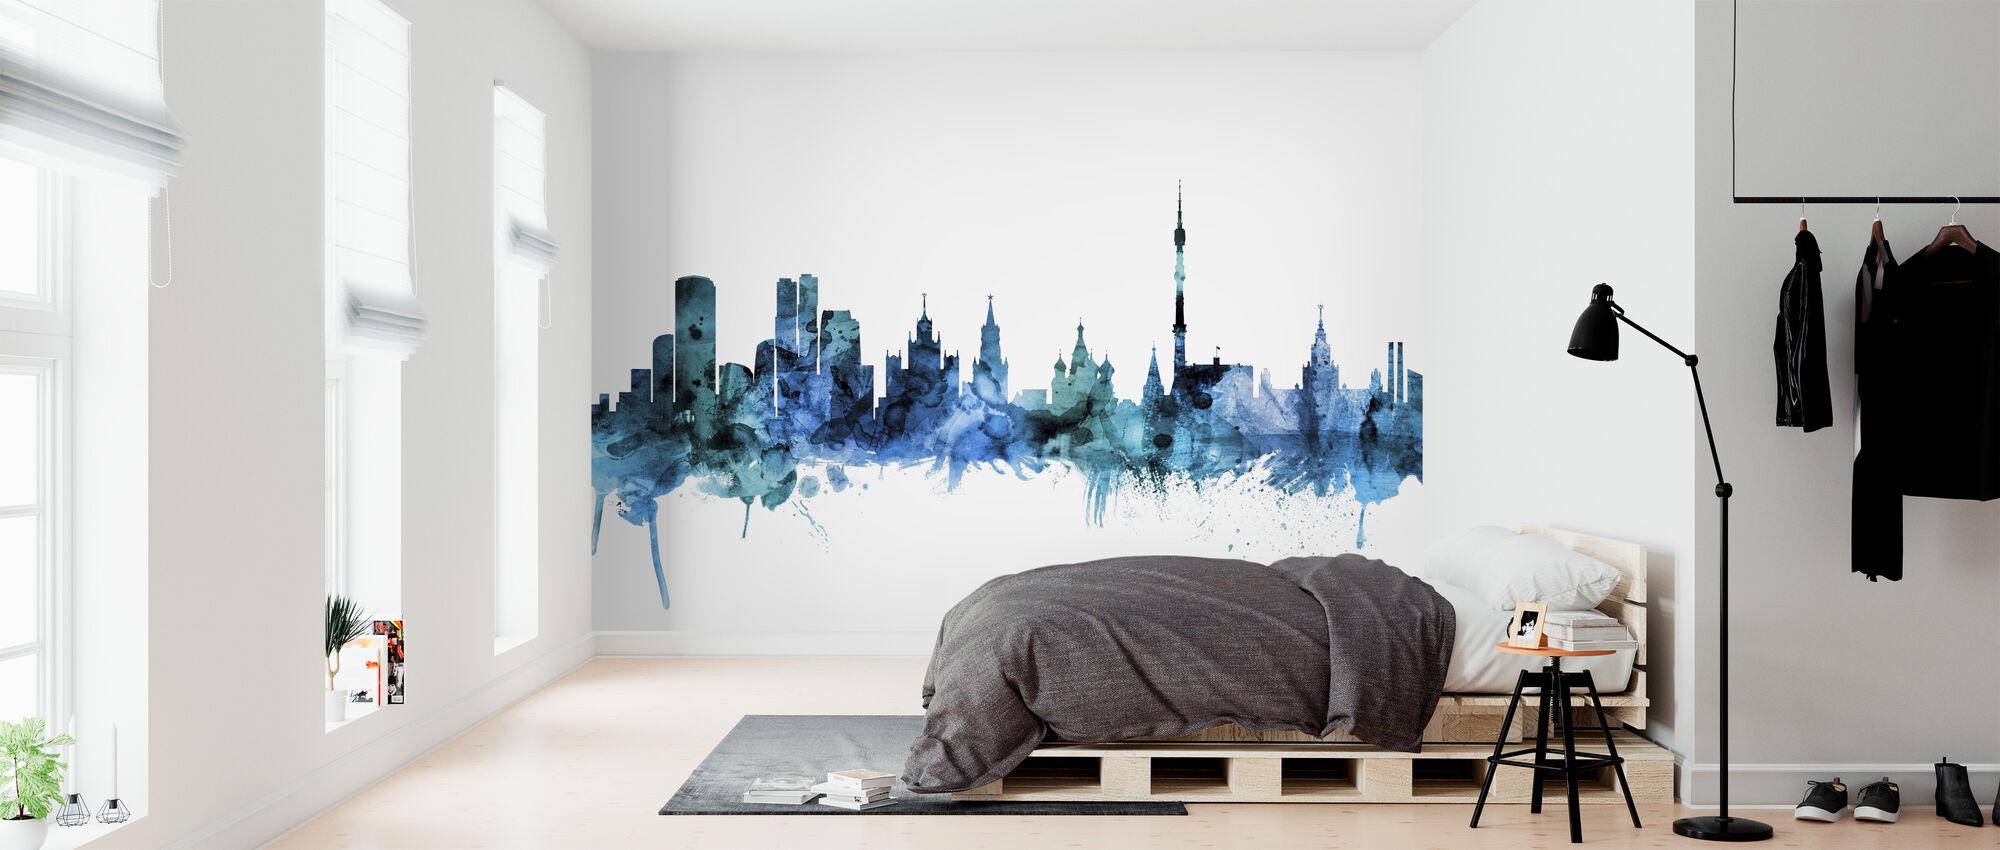 Moscow Russia Skyline - Wallpaper - Bedroom